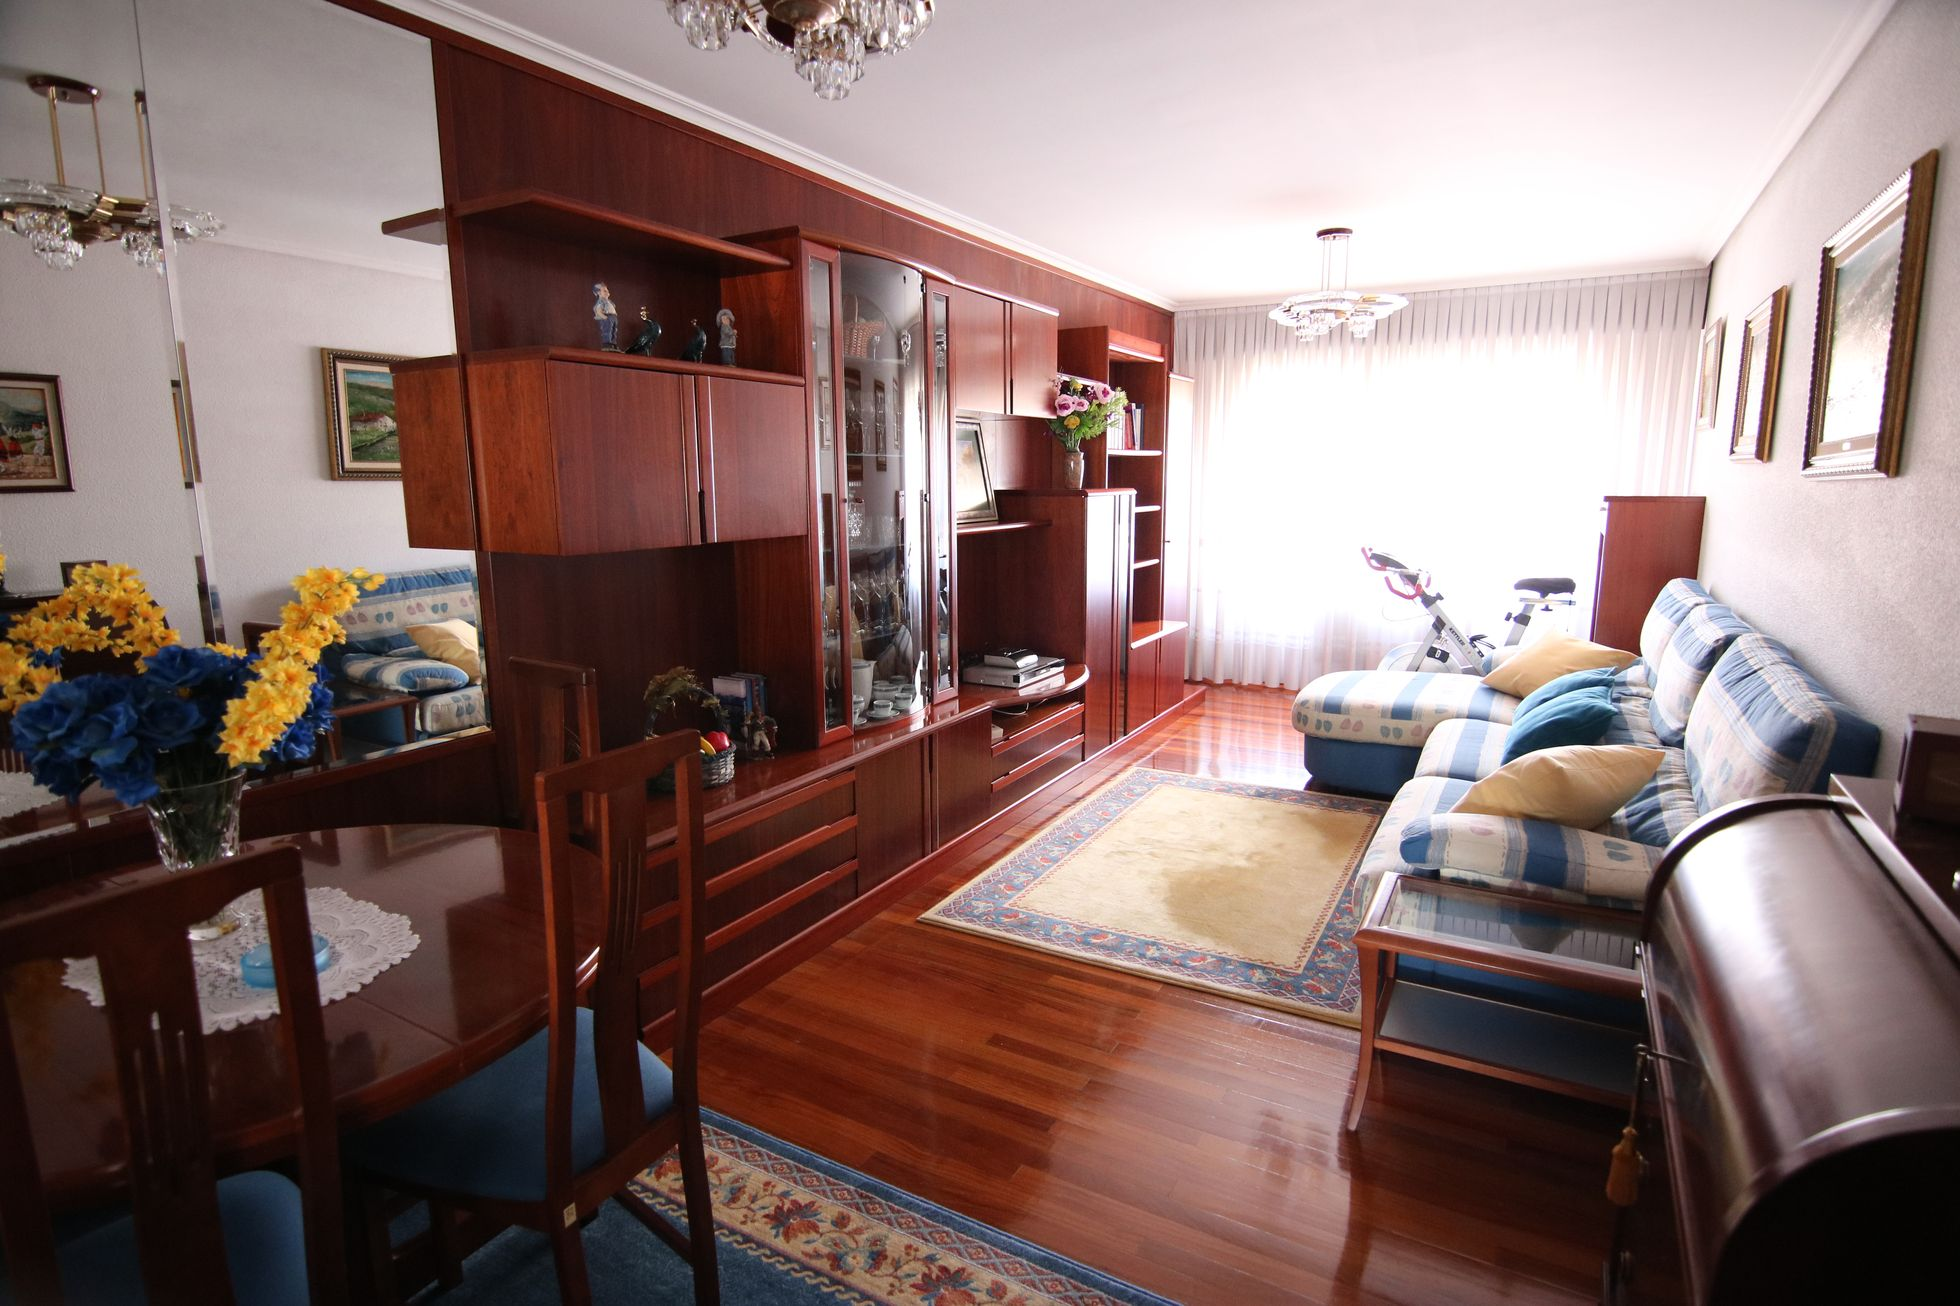 Alquiler pisos basauri amazing piso en basauri soloarte for Pisos alquiler basauri